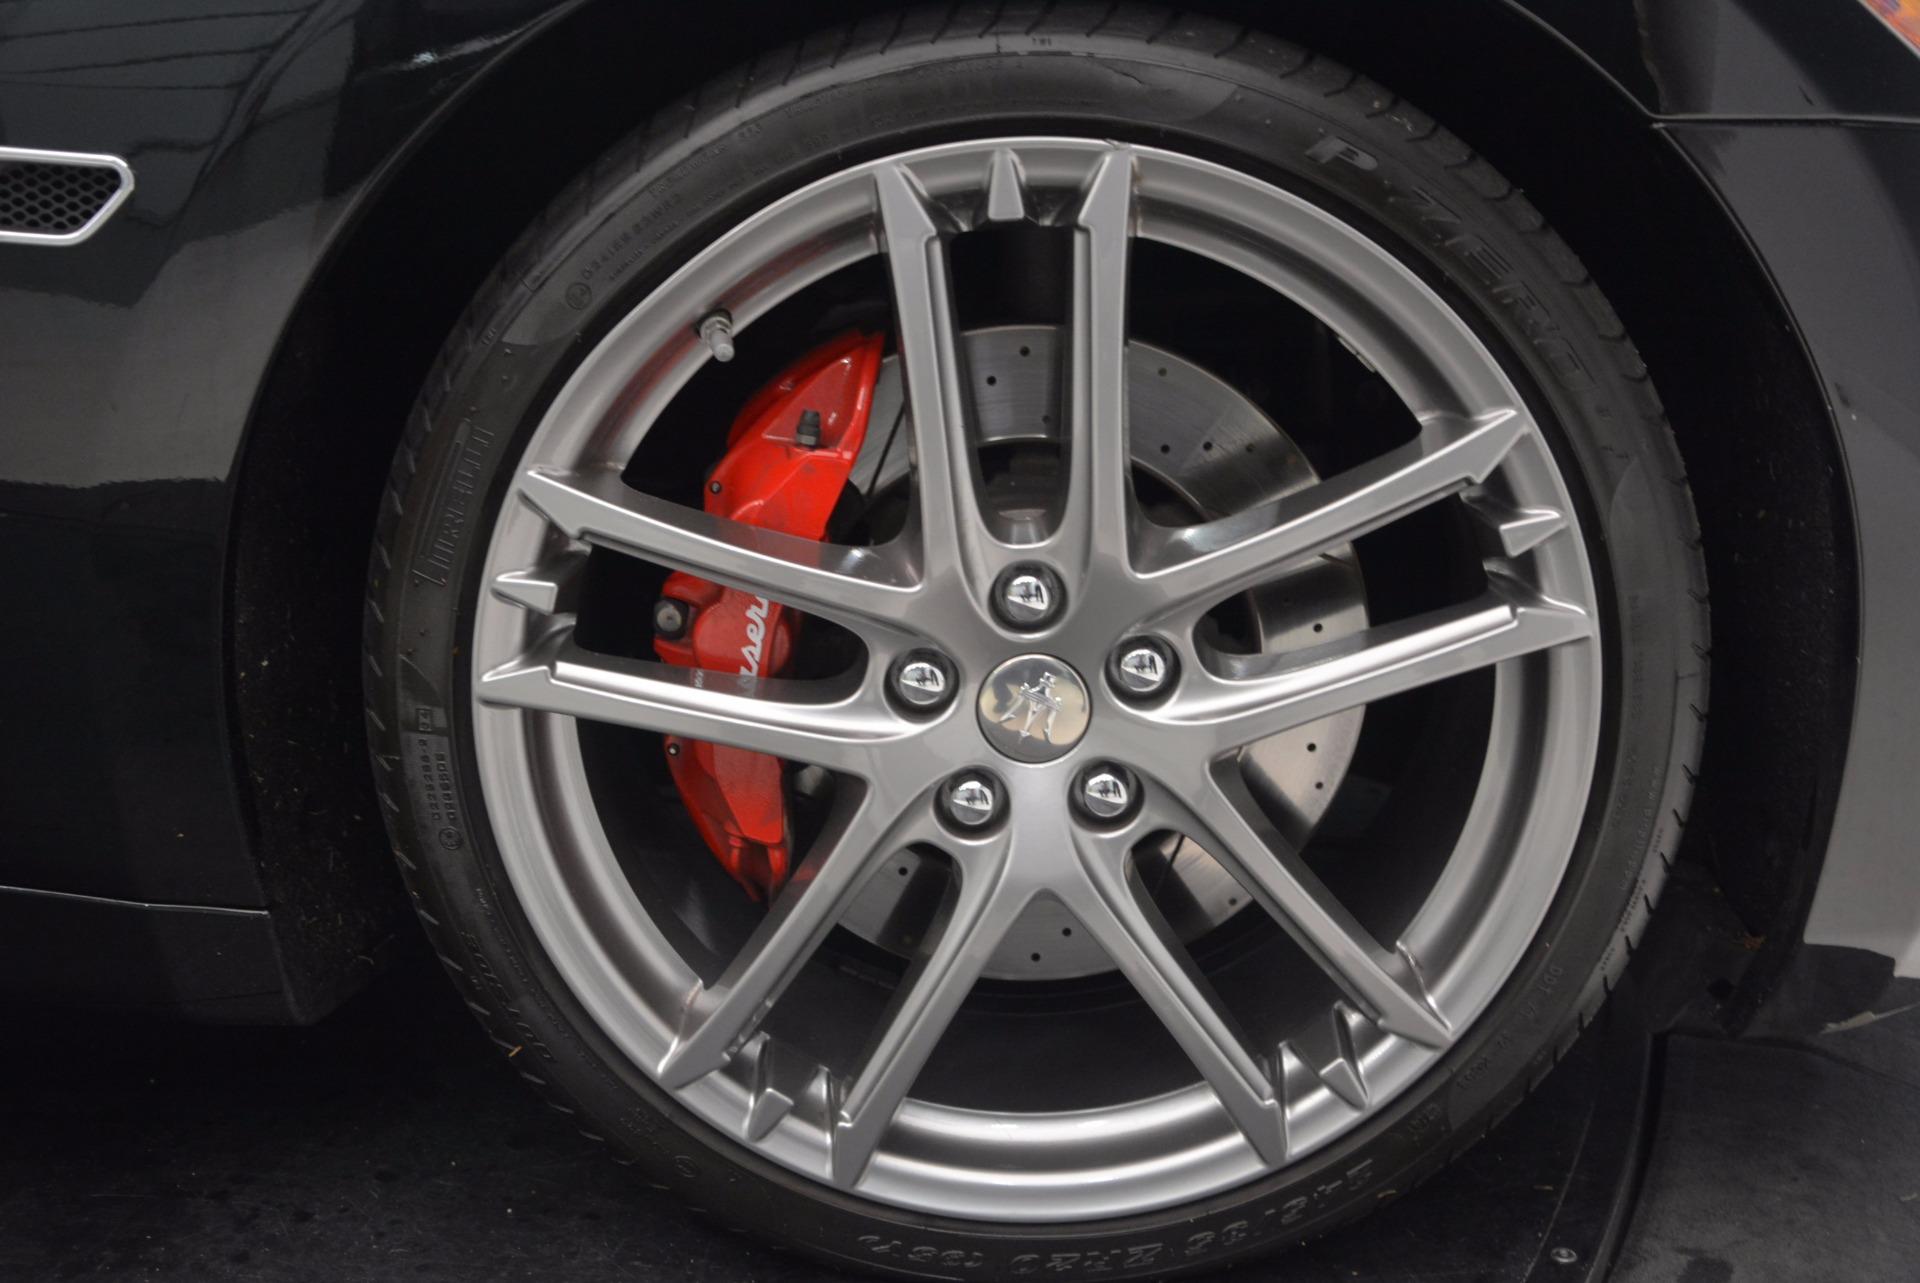 Used 2015 Maserati GranTurismo Sport Coupe For Sale In Westport, CT 1557_p27